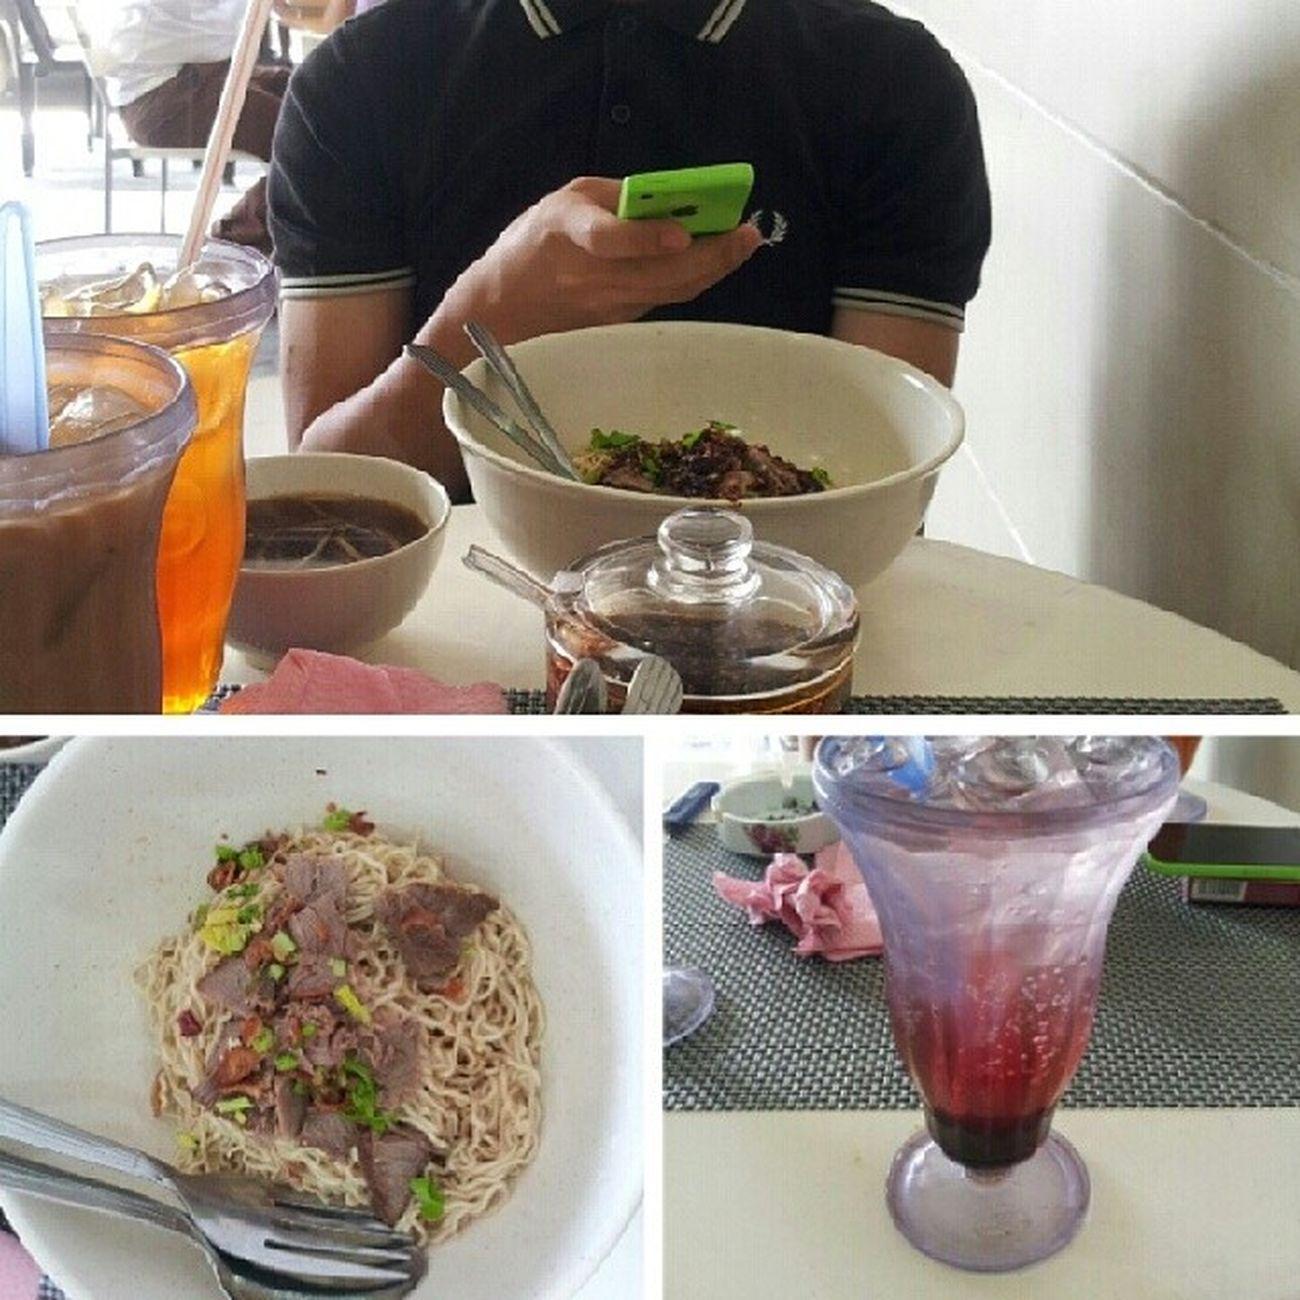 Teman lelaki dapur sarawak mee kolok teh c-peng sprite ribena Perfect5 Meekoloknangnyaman Diapakaifredperryooooiii ahahaha...